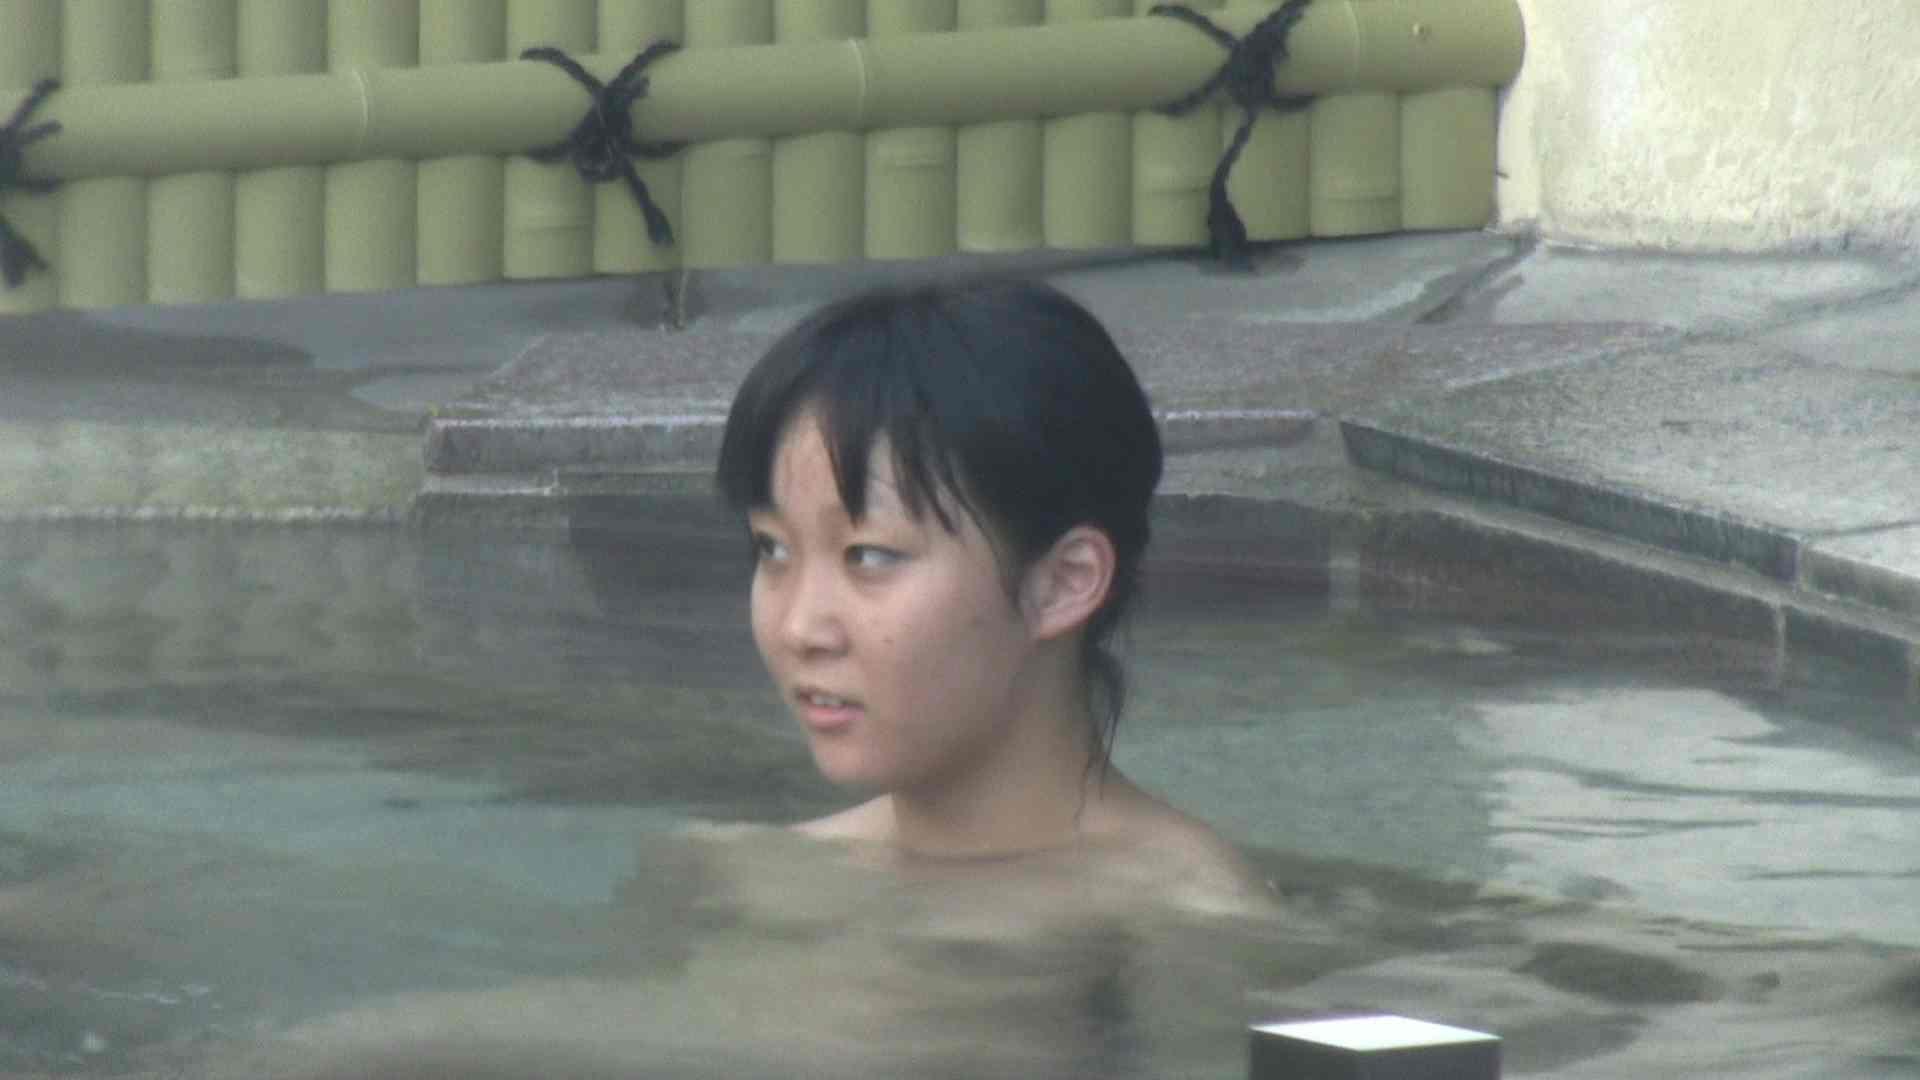 Aquaな露天風呂Vol.196 HなOL | 盗撮  91pic 11